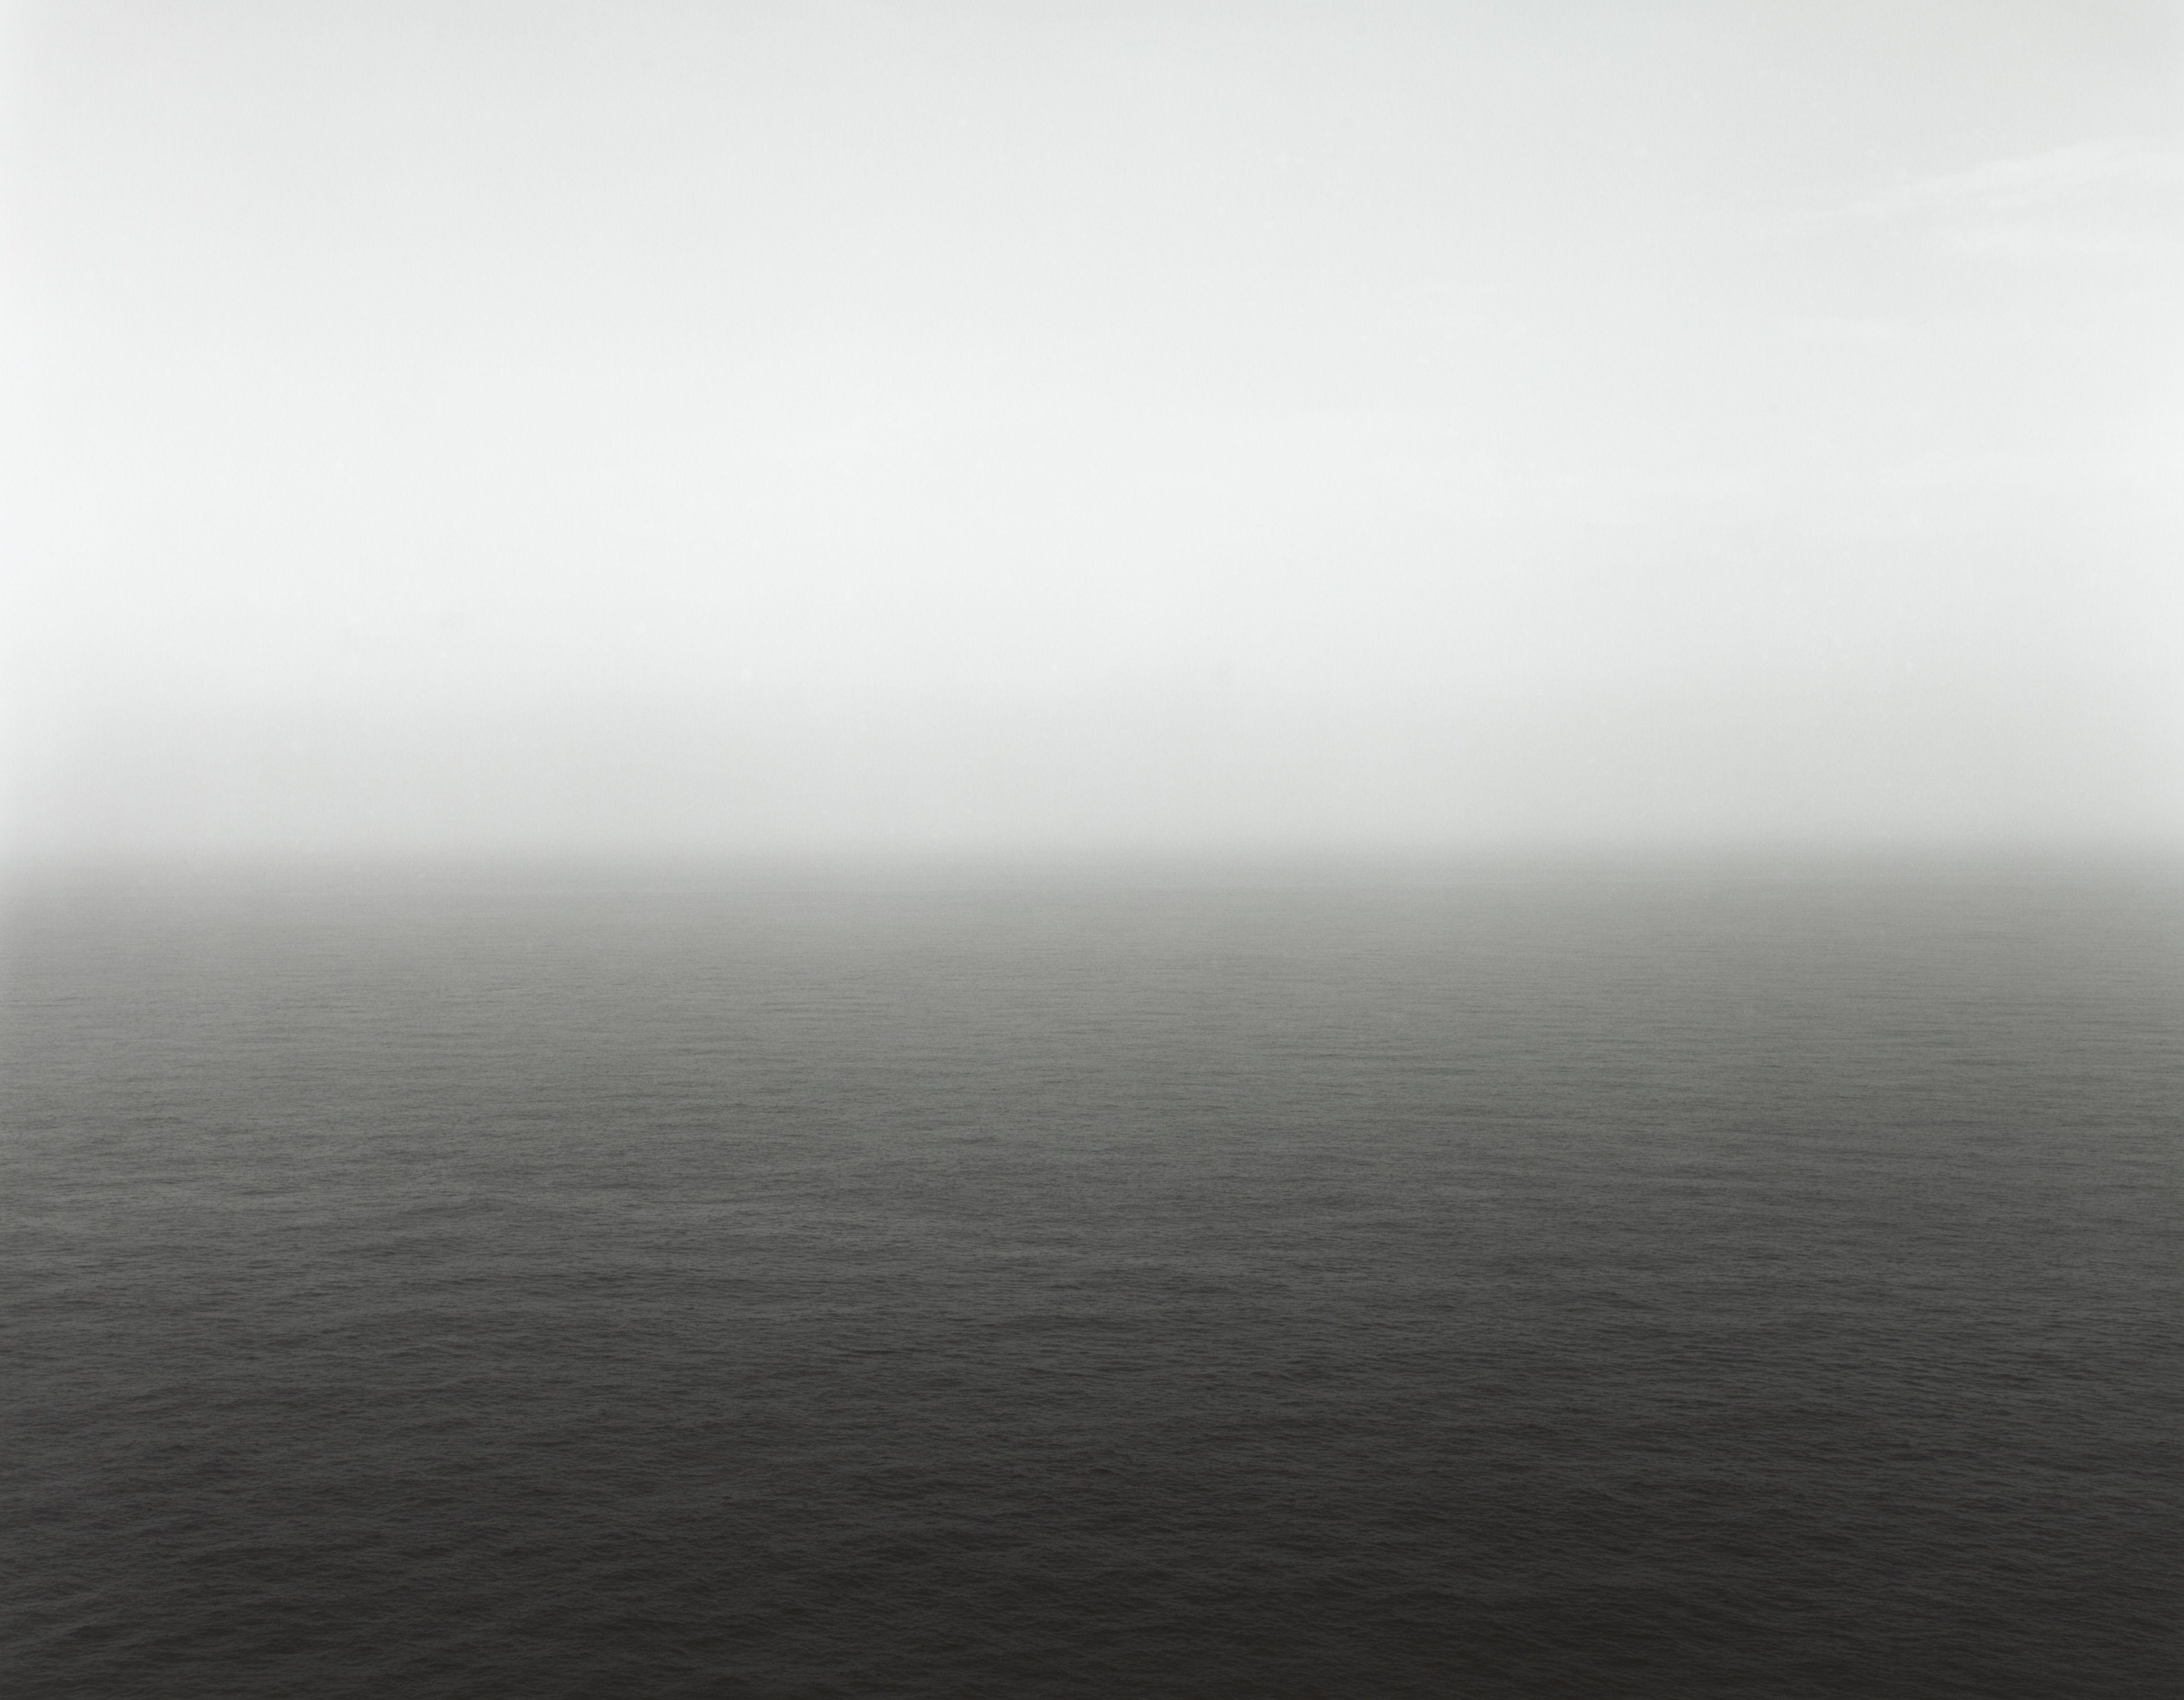 hiroshi sugimoto seascapes - Google Search | Photographers ...